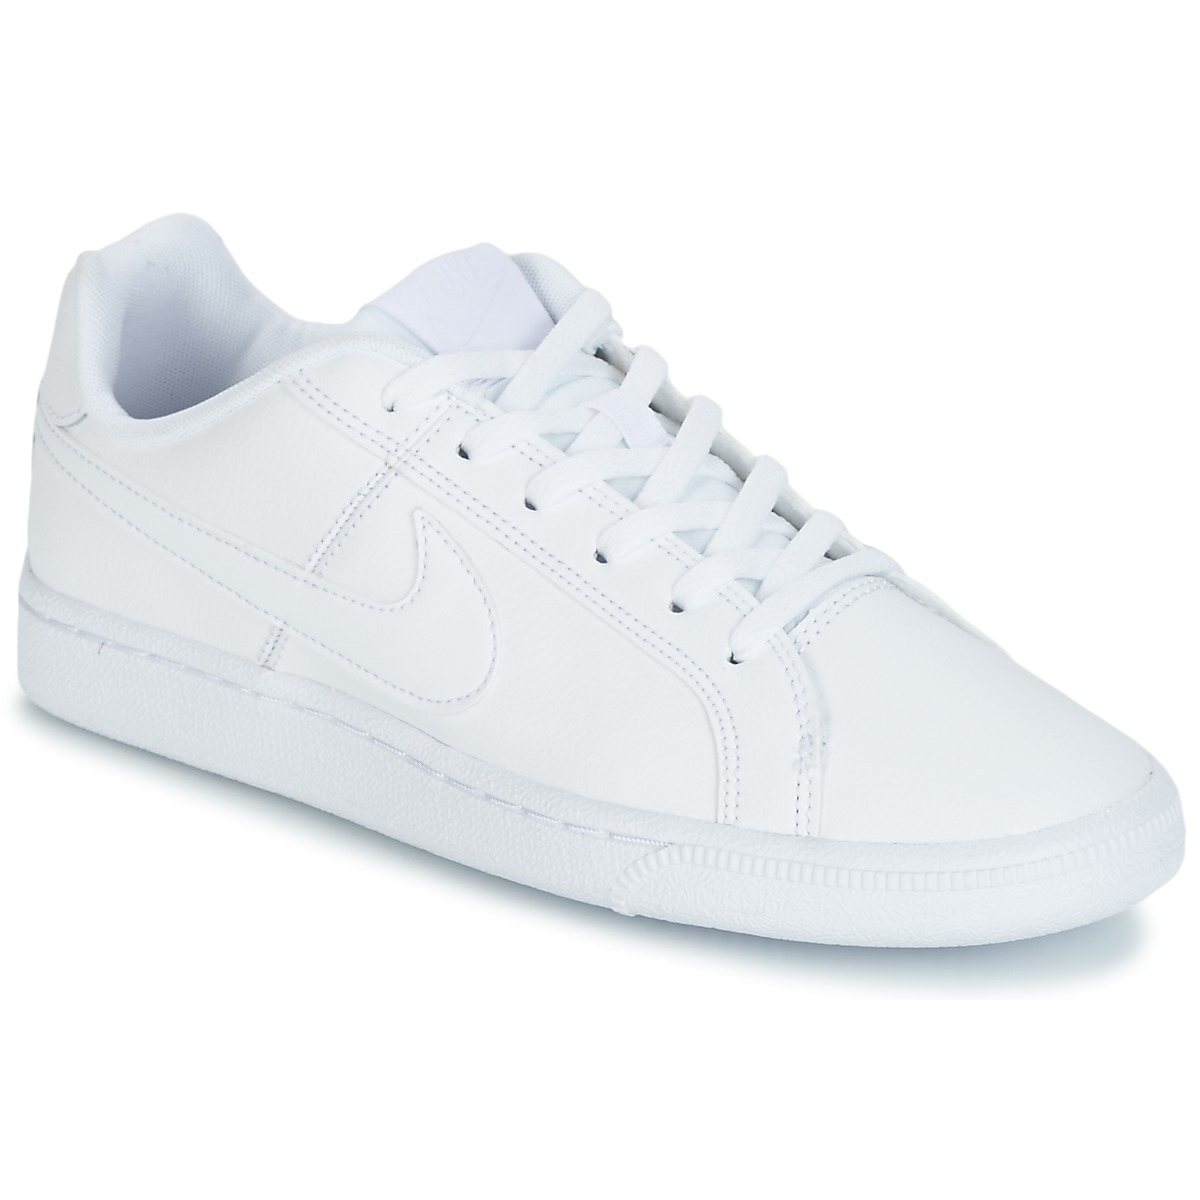 buy popular 85064 94ecd Nike COURT ROYALE GRADE SCHOOL Blanc - Chaussures Baskets basses Enfant  41,60 €